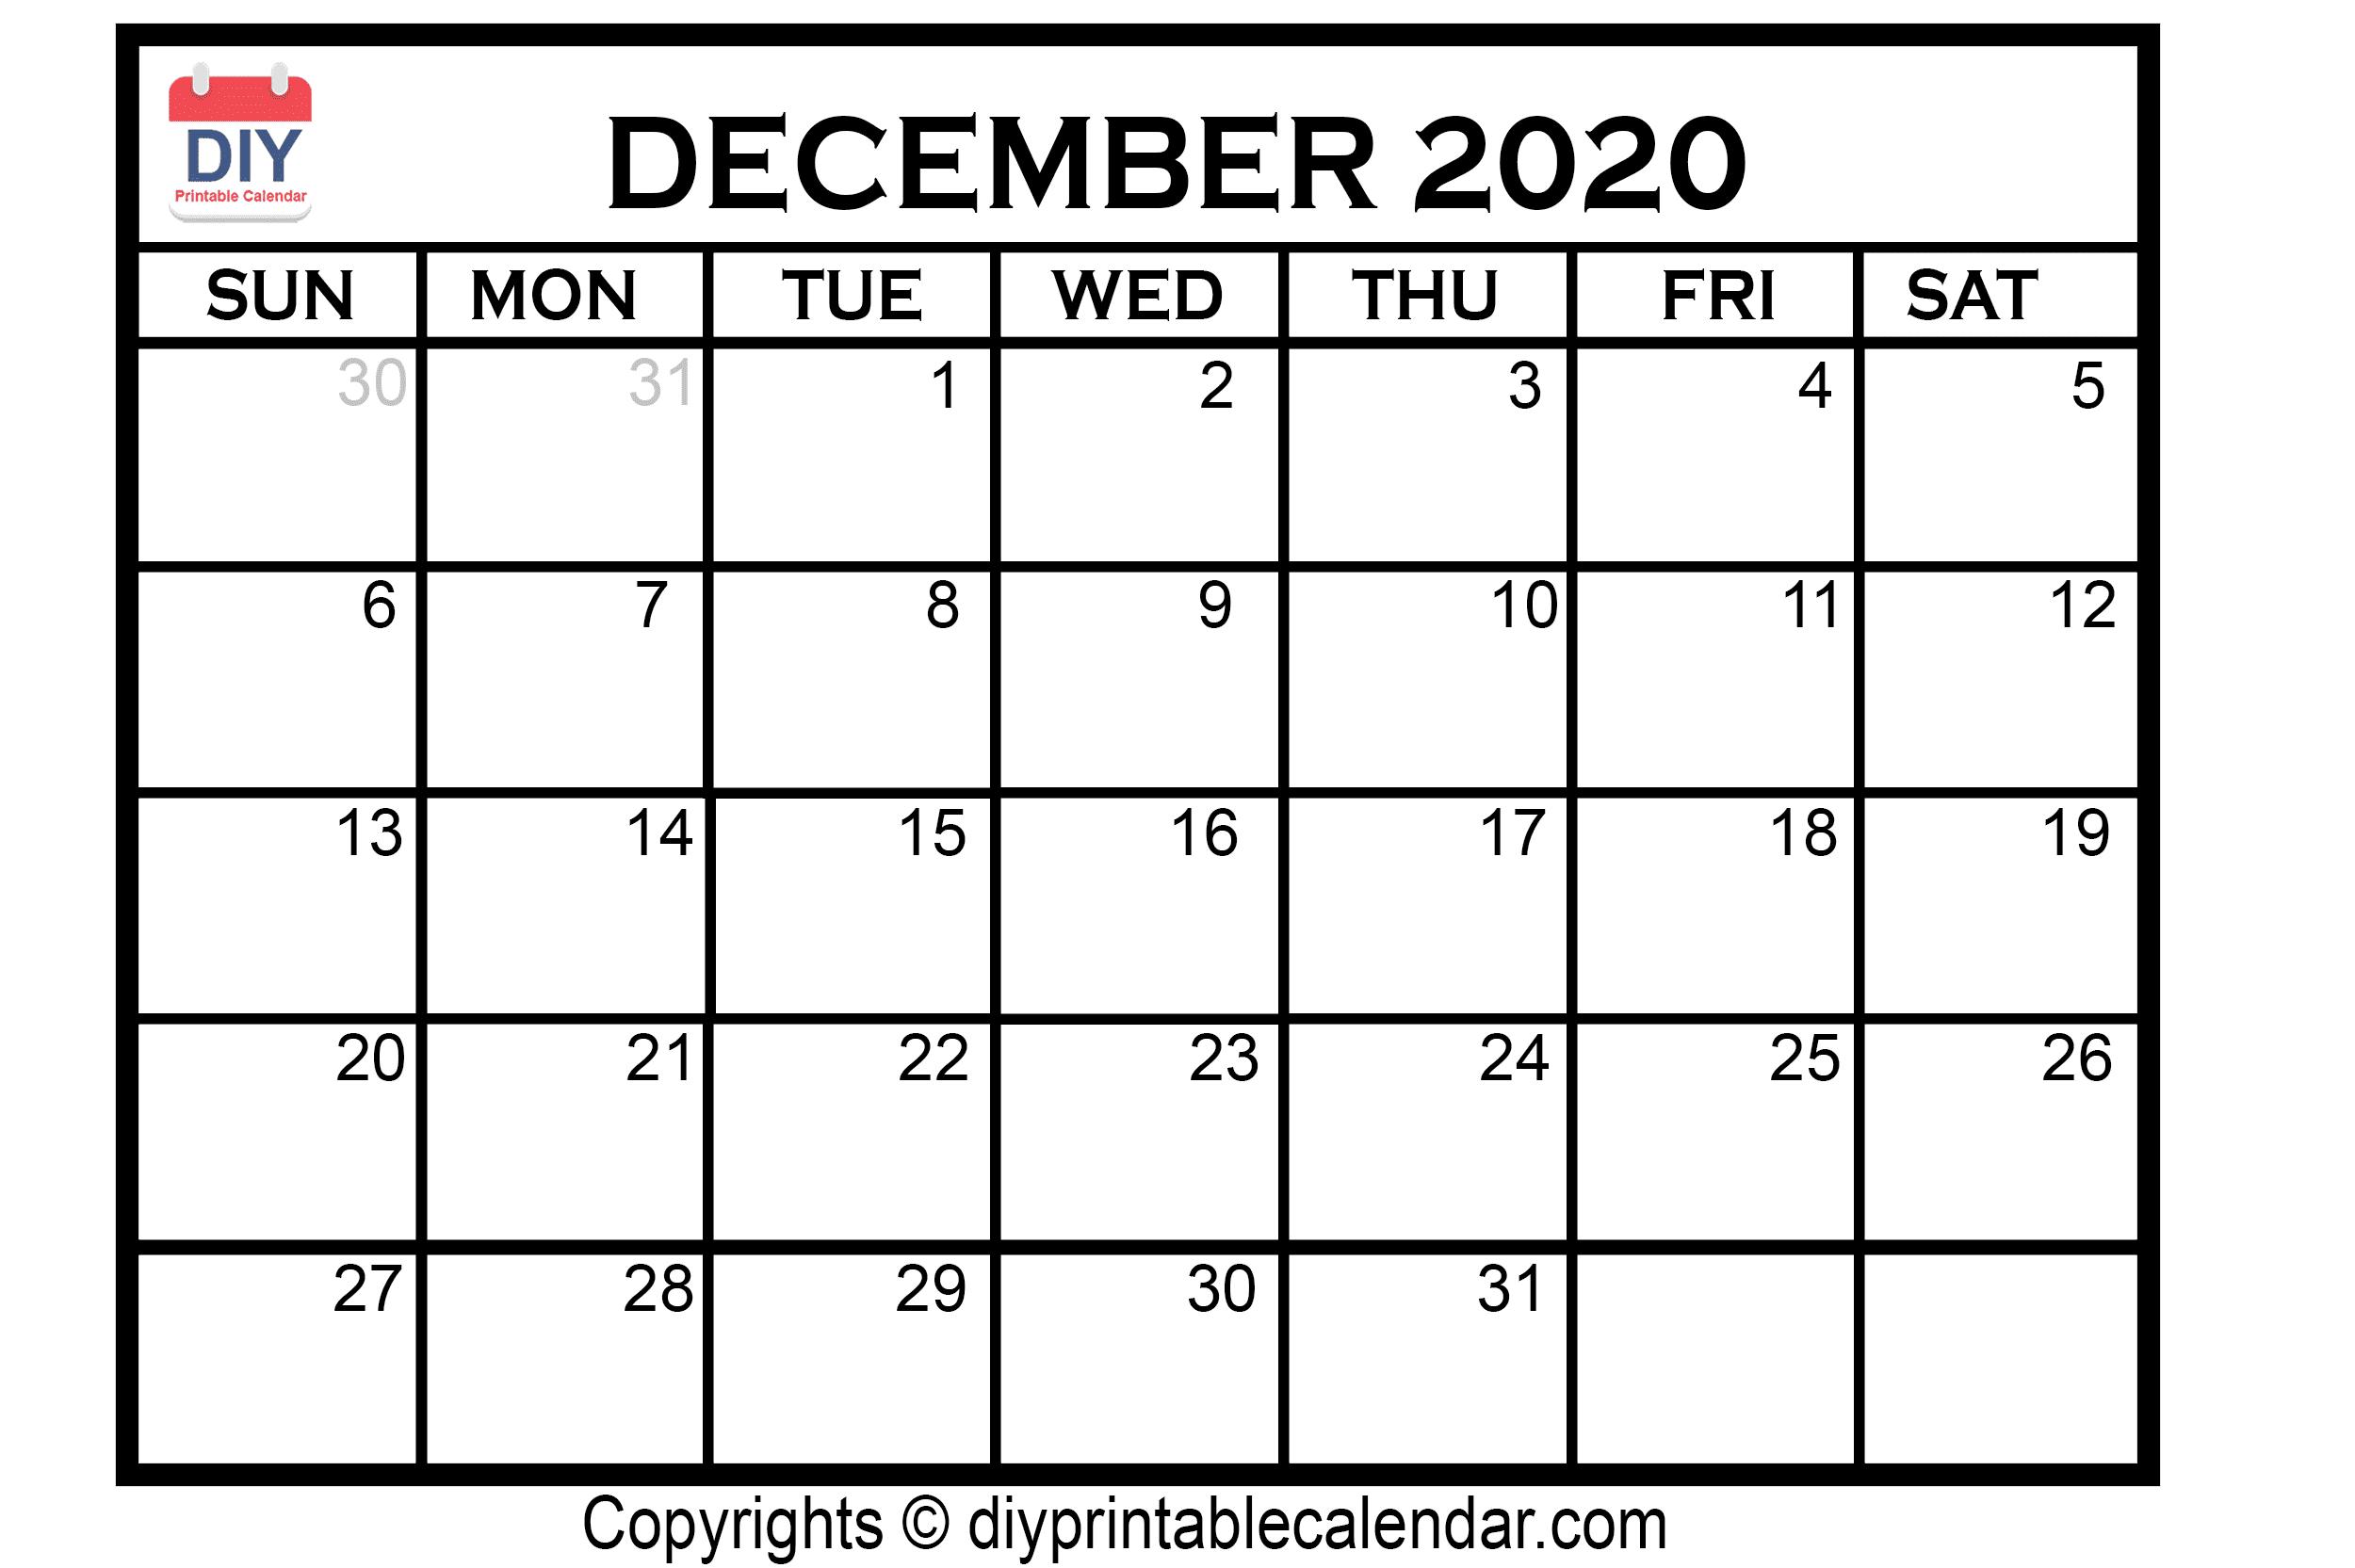 December 2020 Printable Calendar Template within Calander December 2020